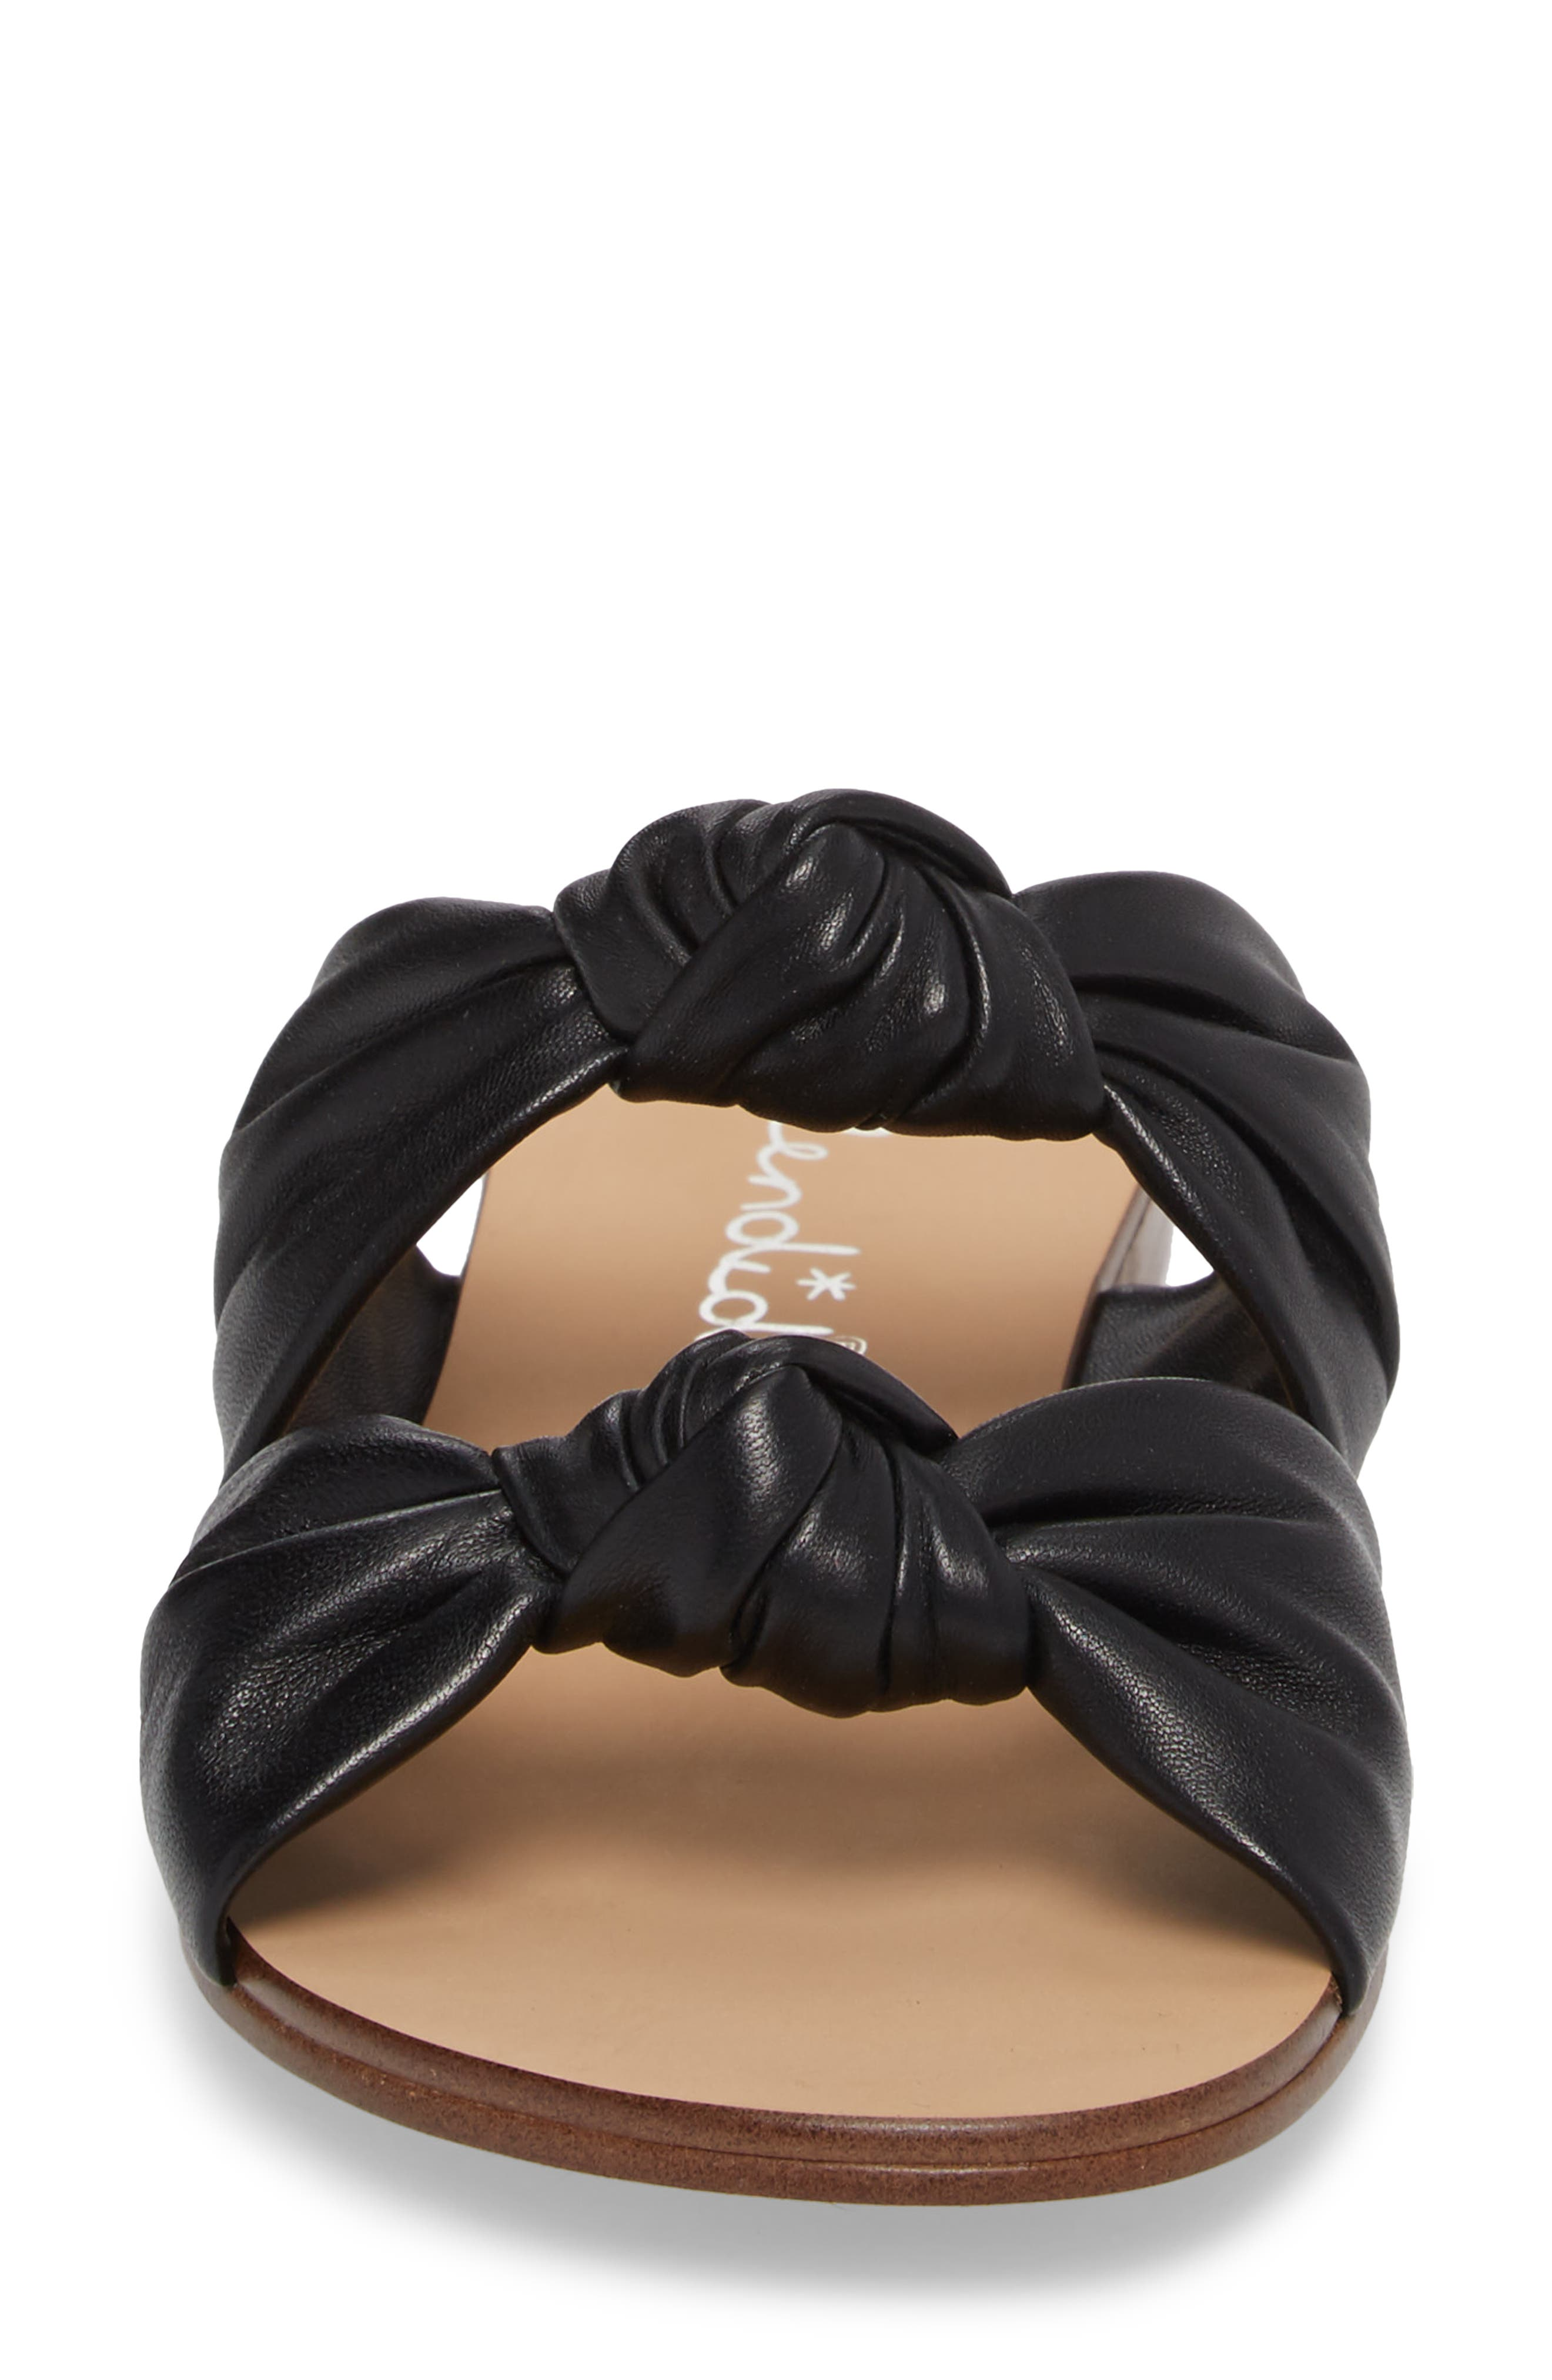 Barton Double Knotted Slide Sandal,                             Alternate thumbnail 4, color,                             BLACK LEATHER